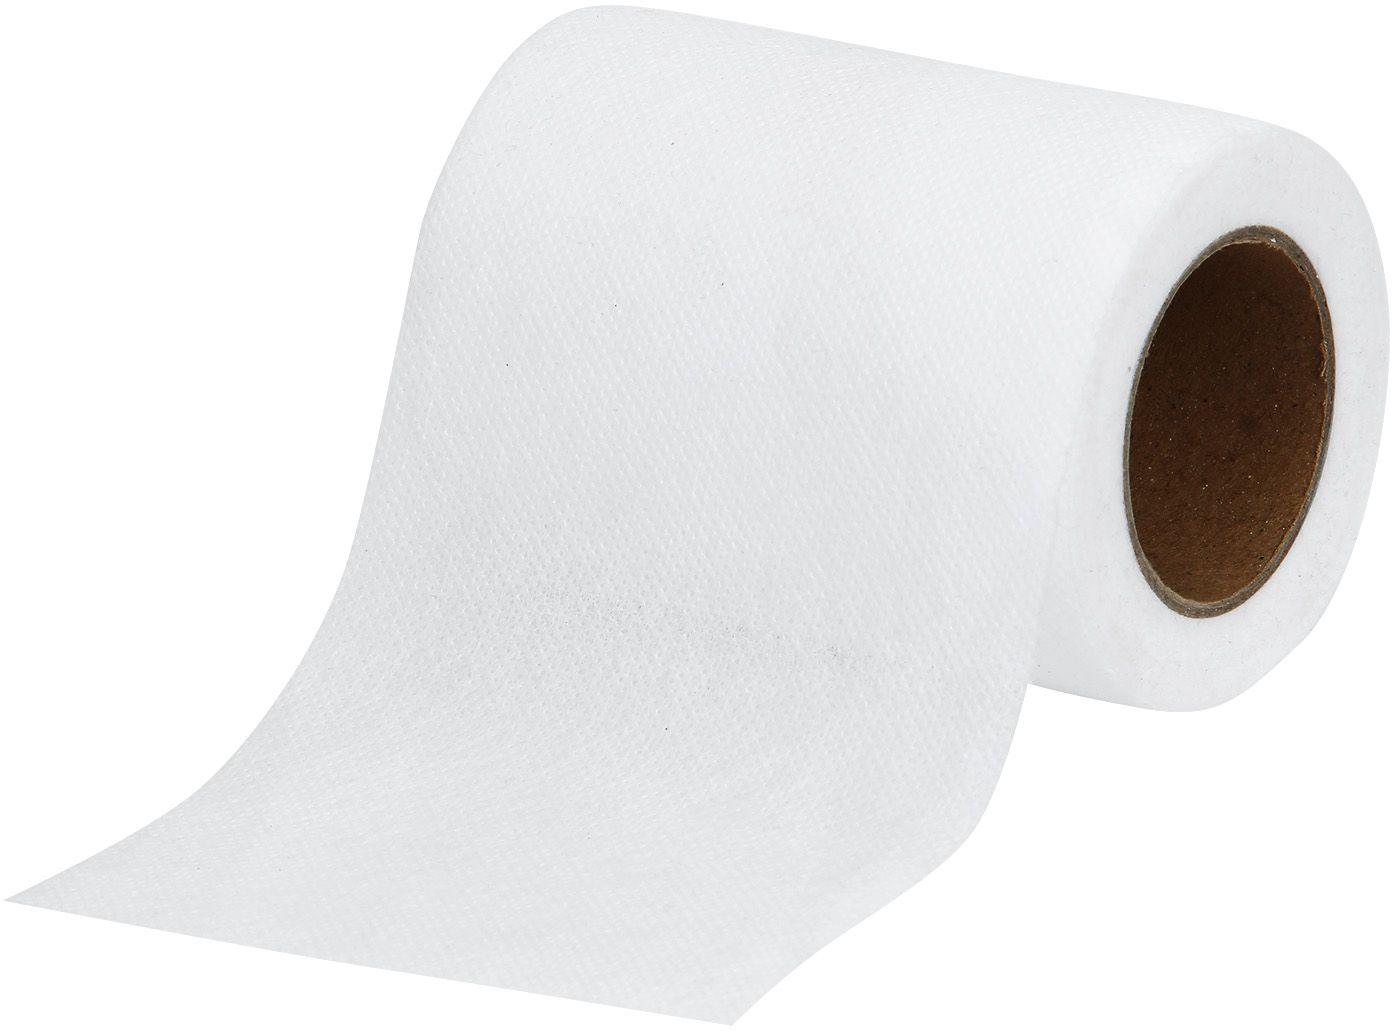 Nep toilet papier